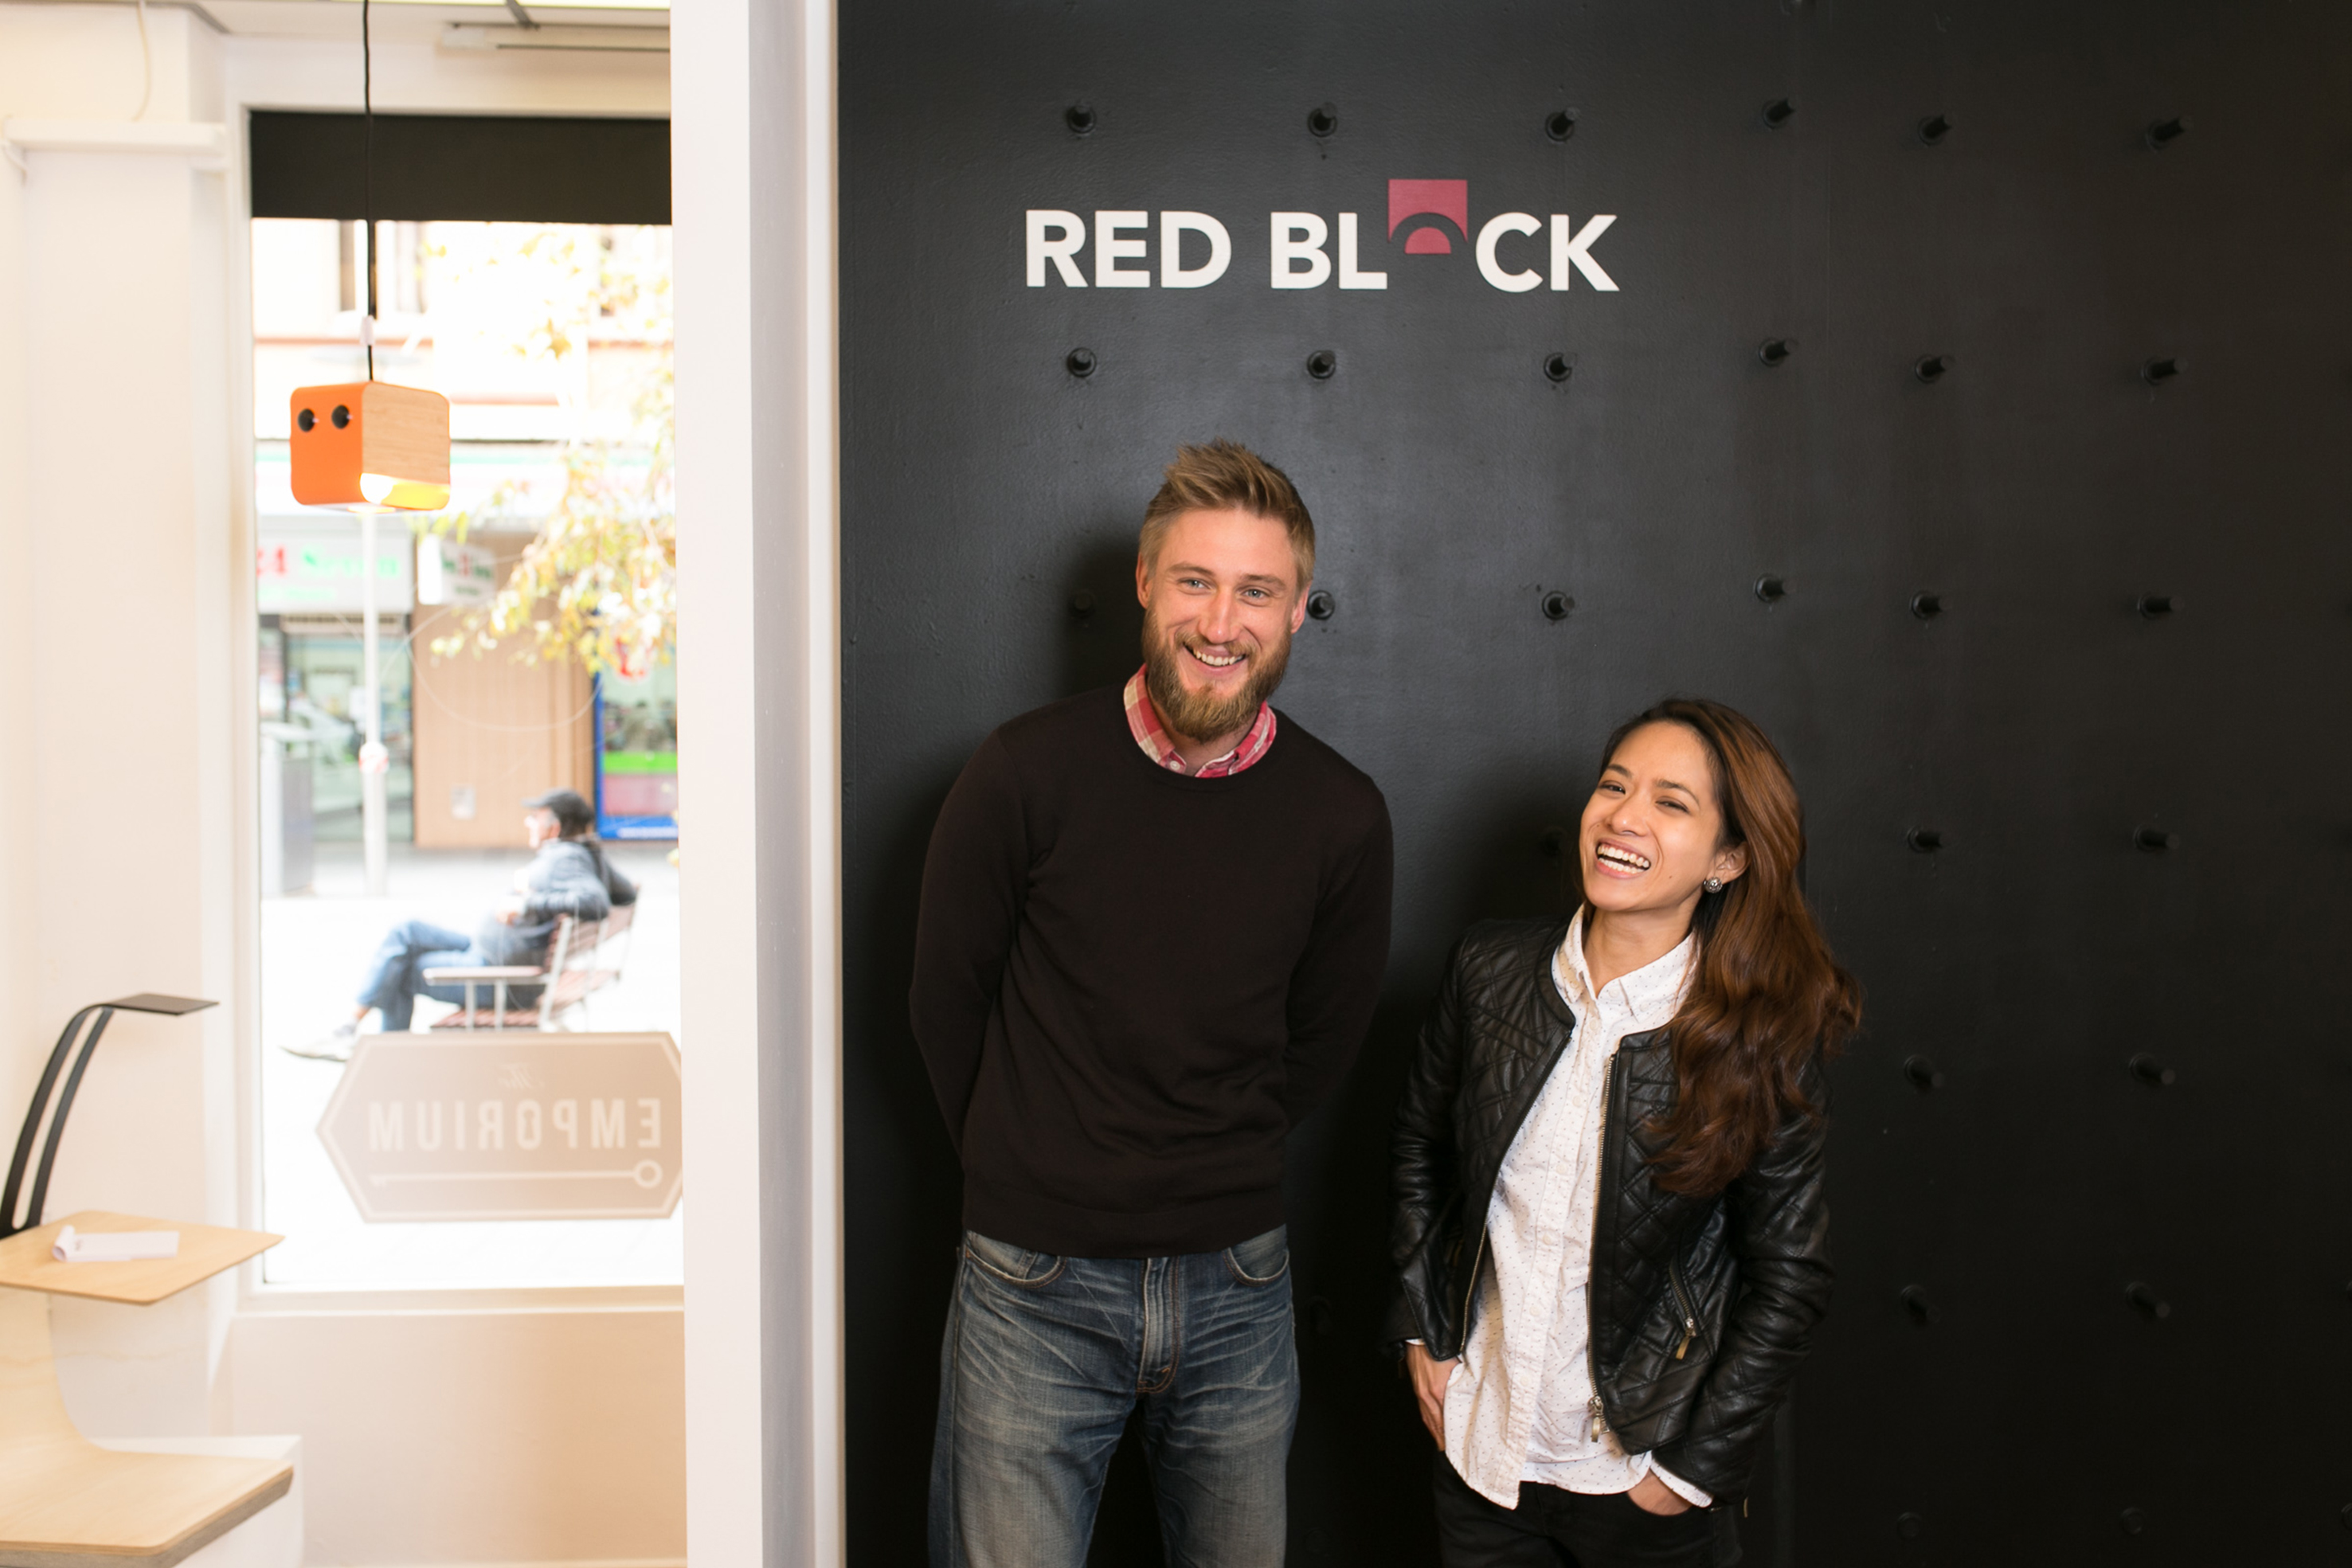 MAKEit MADEit Conference - Red Block Design